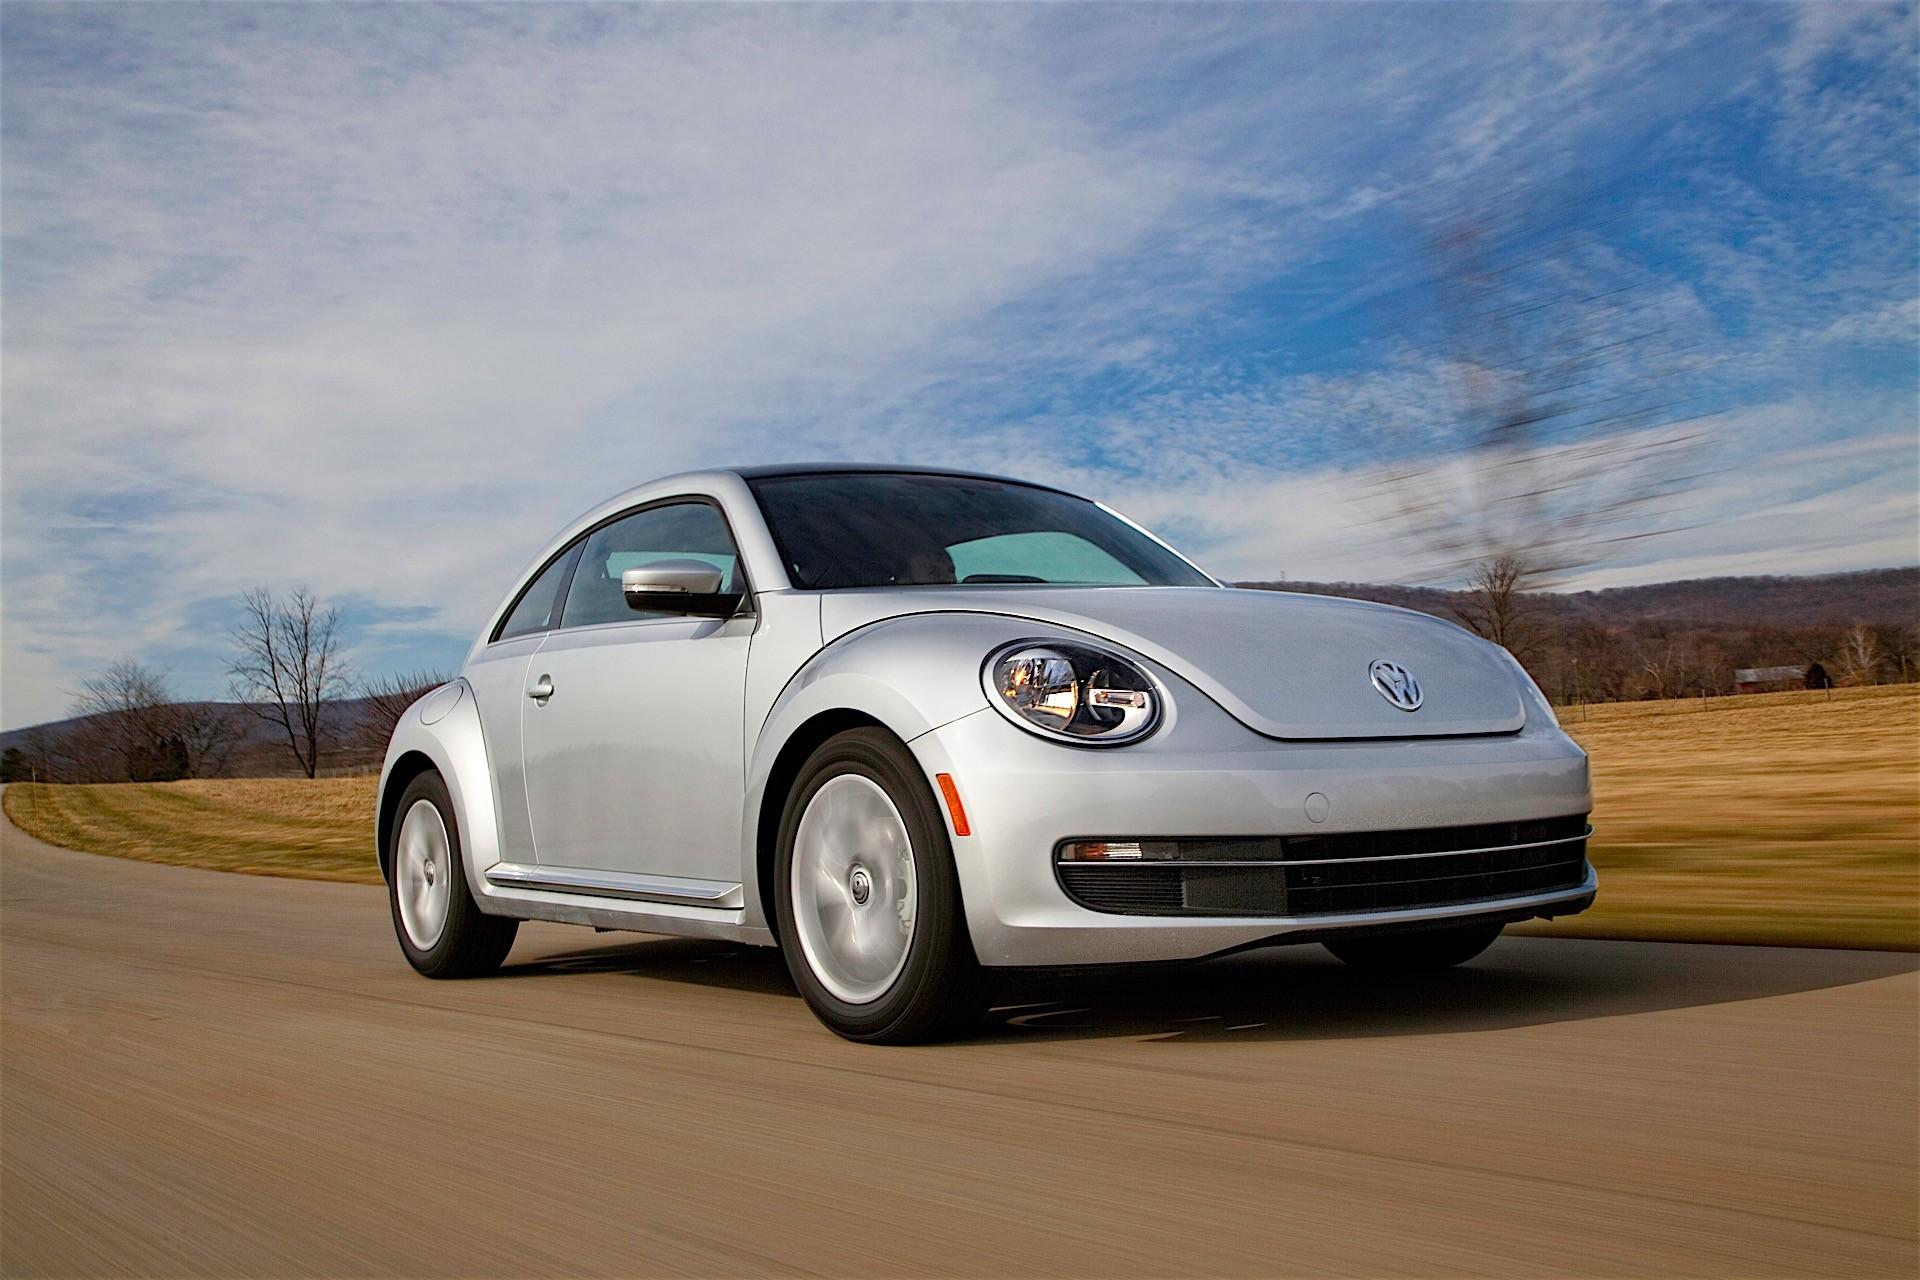 Volkswagen Got Fined $5.5 million In Italy Because of Dieselgate - autoevolution